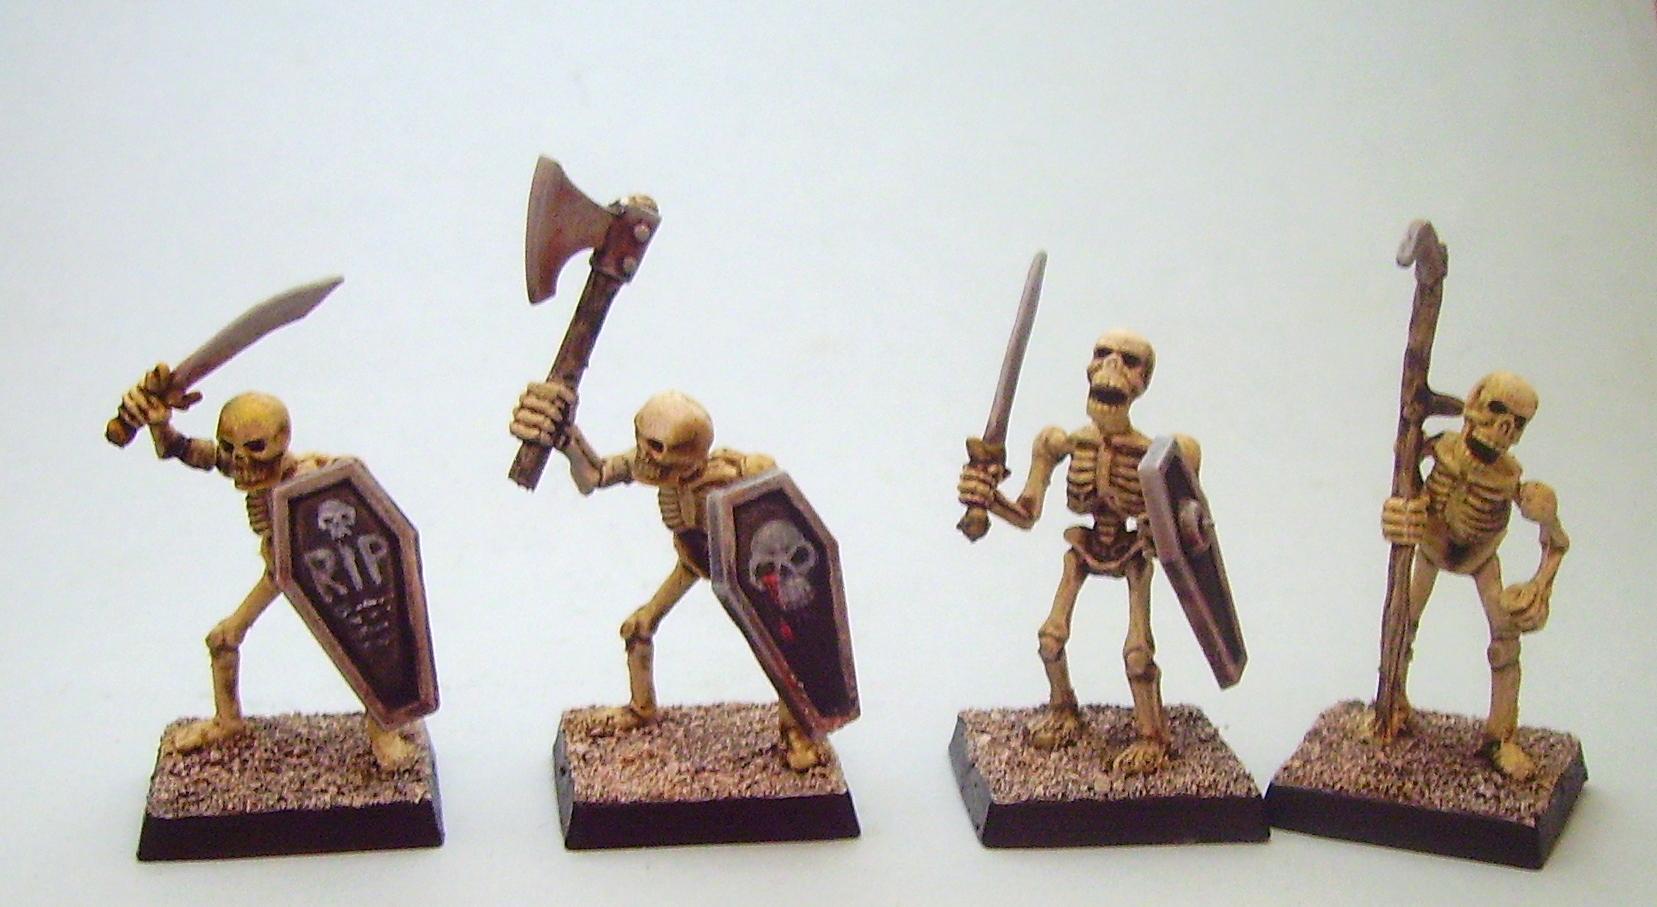 1980s skeletons